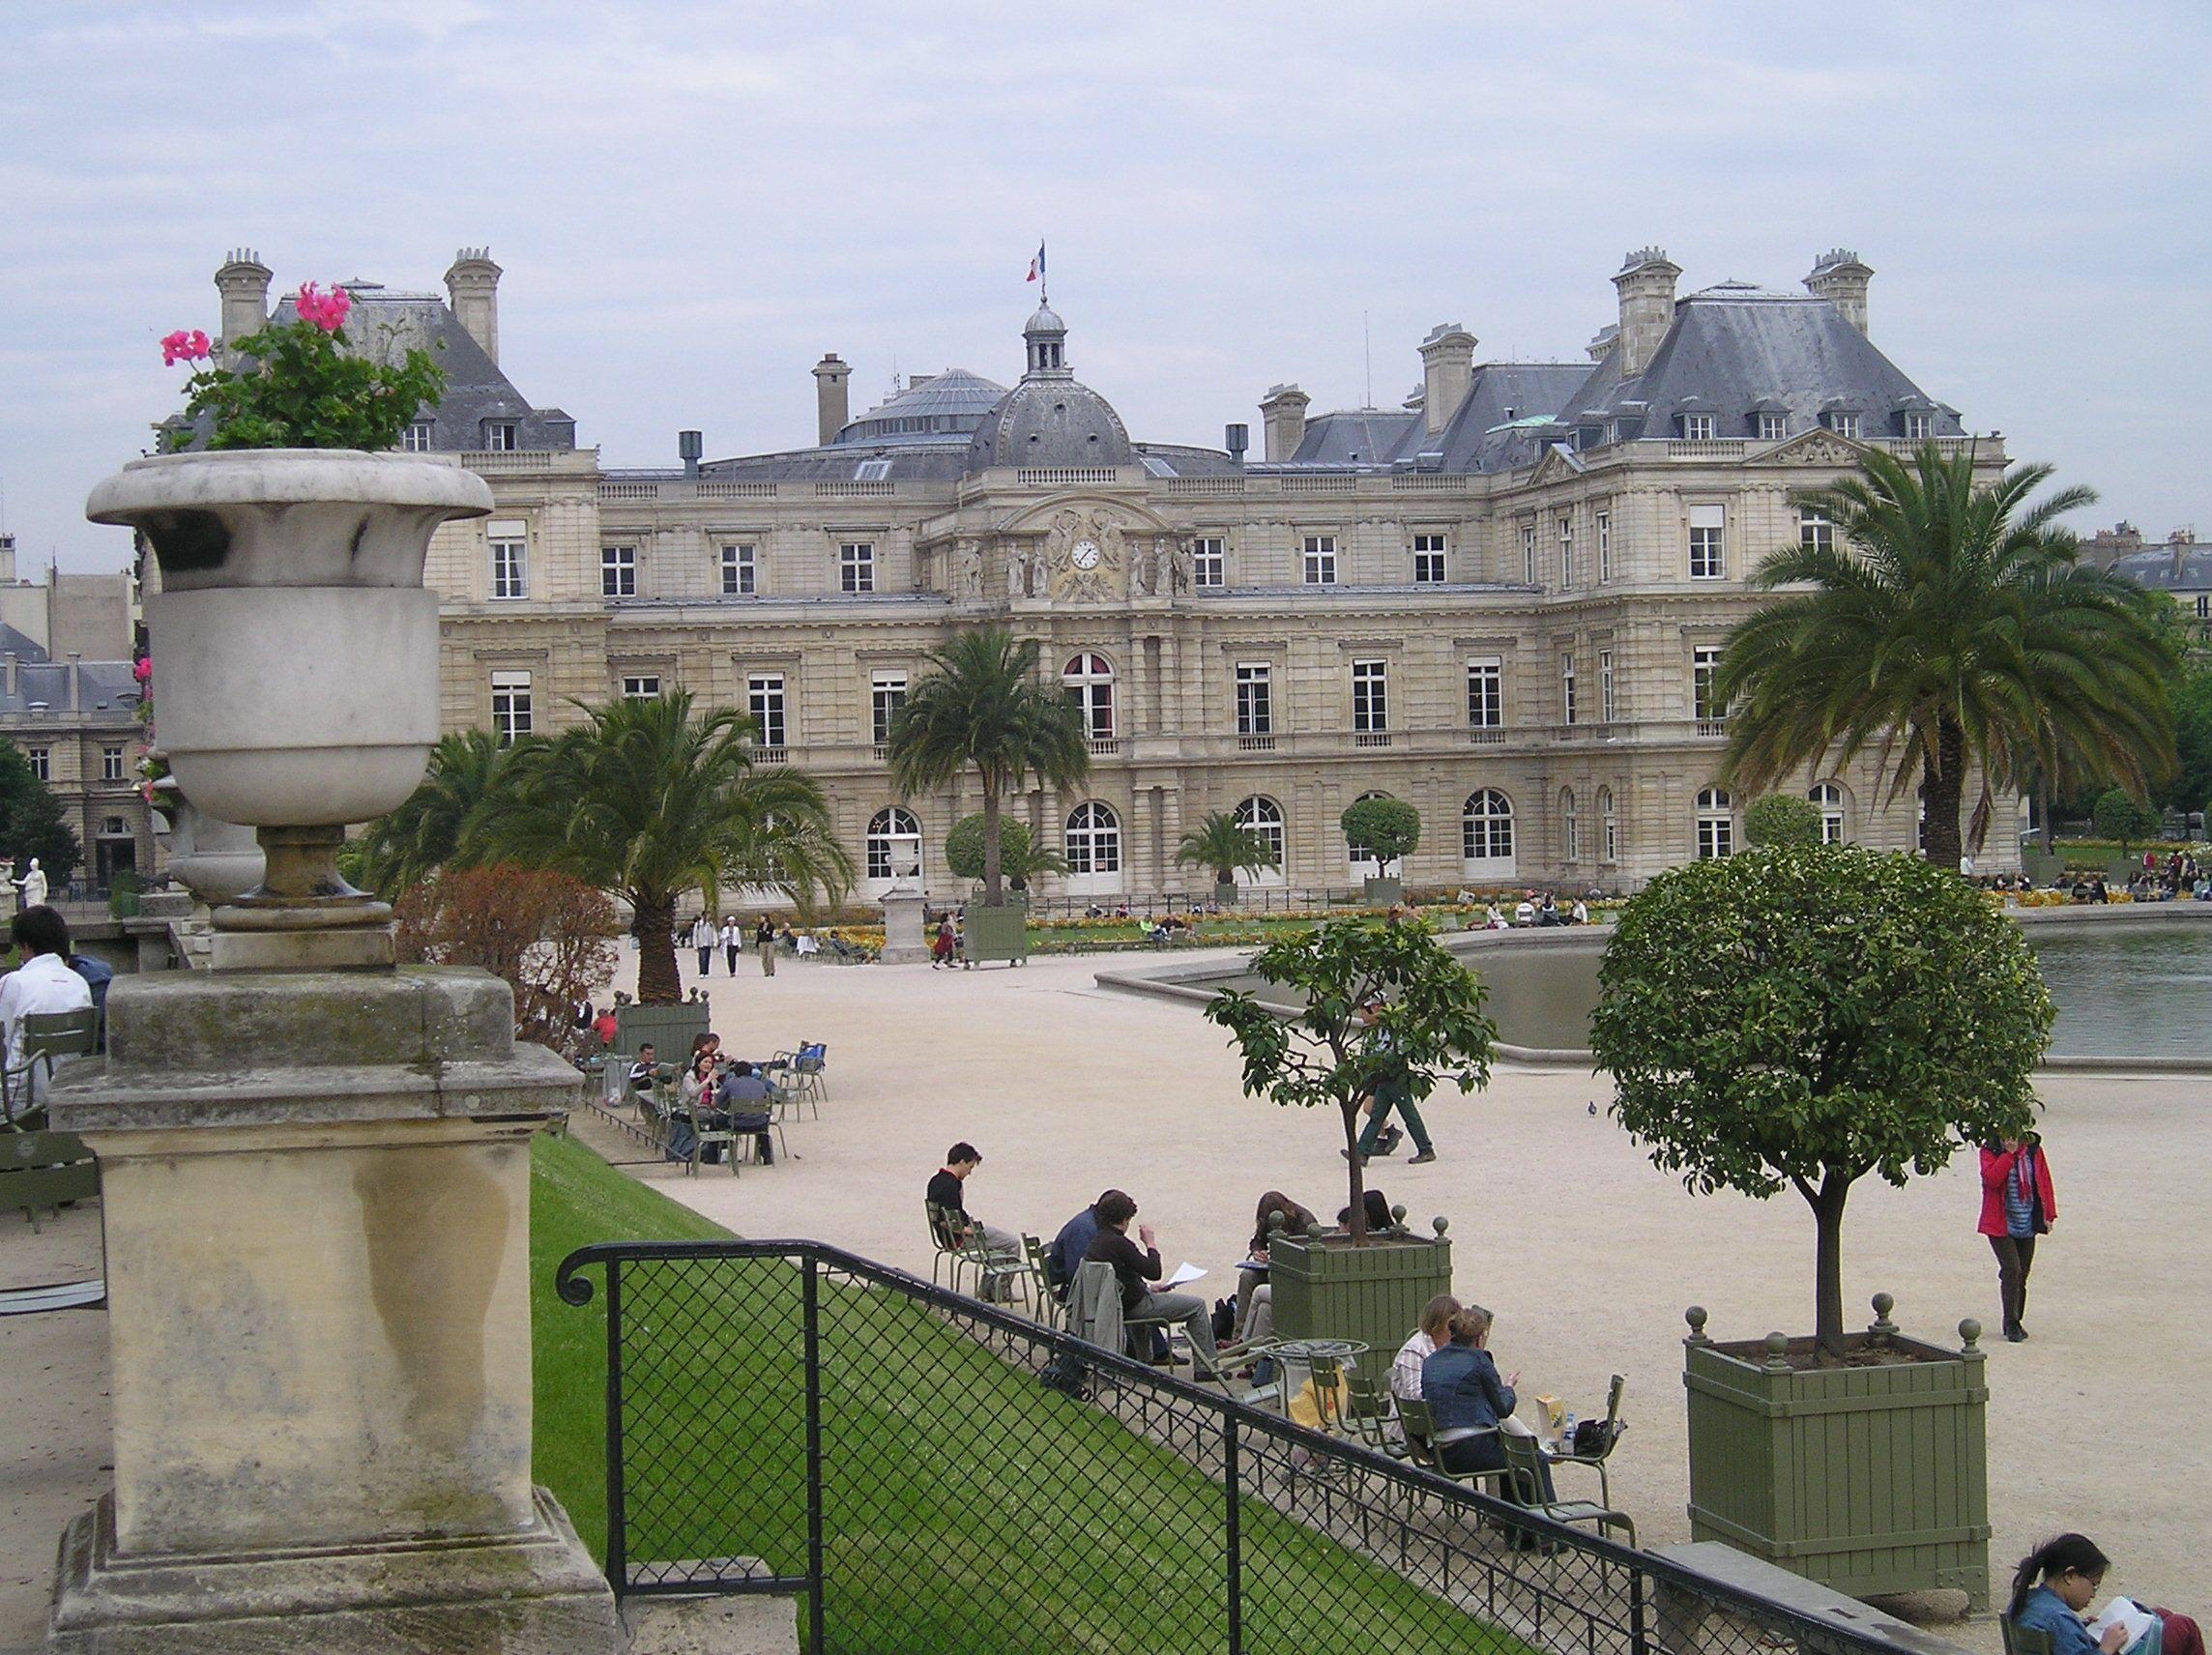 Luxenborg Palace